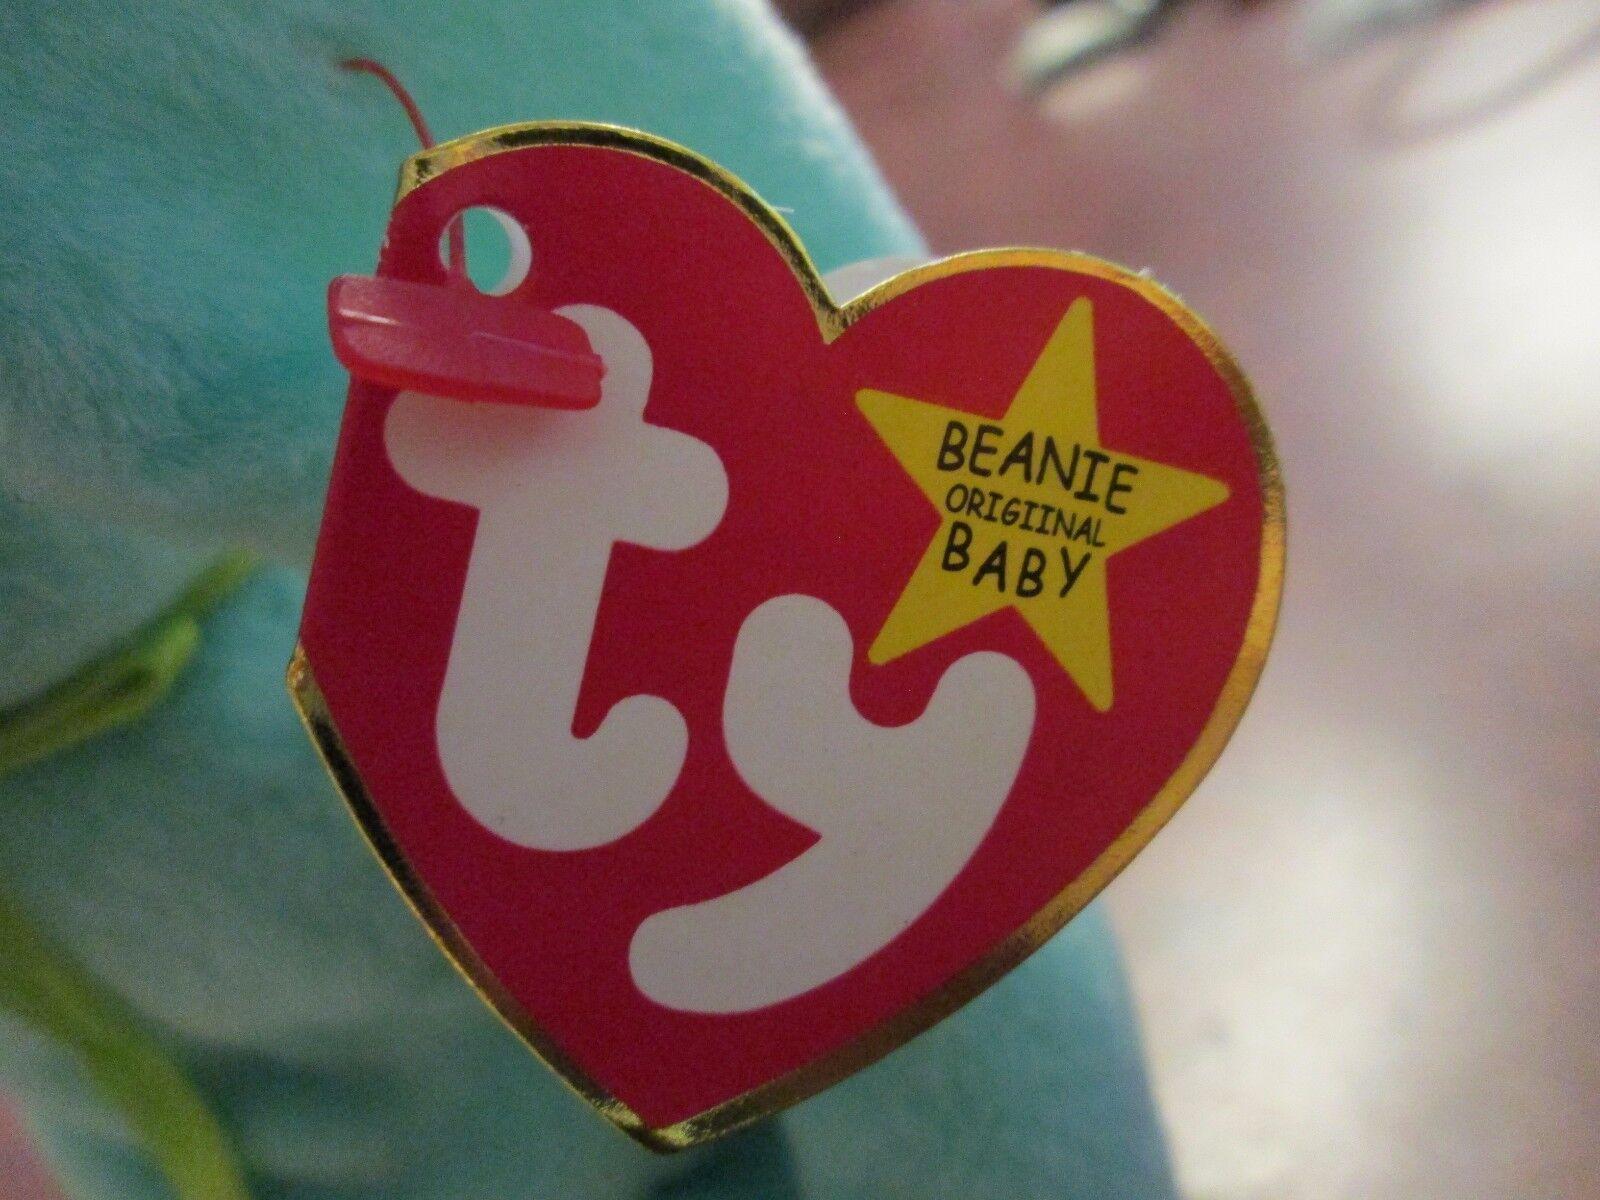 MWMT MWMT MWMT Hippity Bunny TY original beanie baby RETIRED double misprint hang tag 1996 edf916